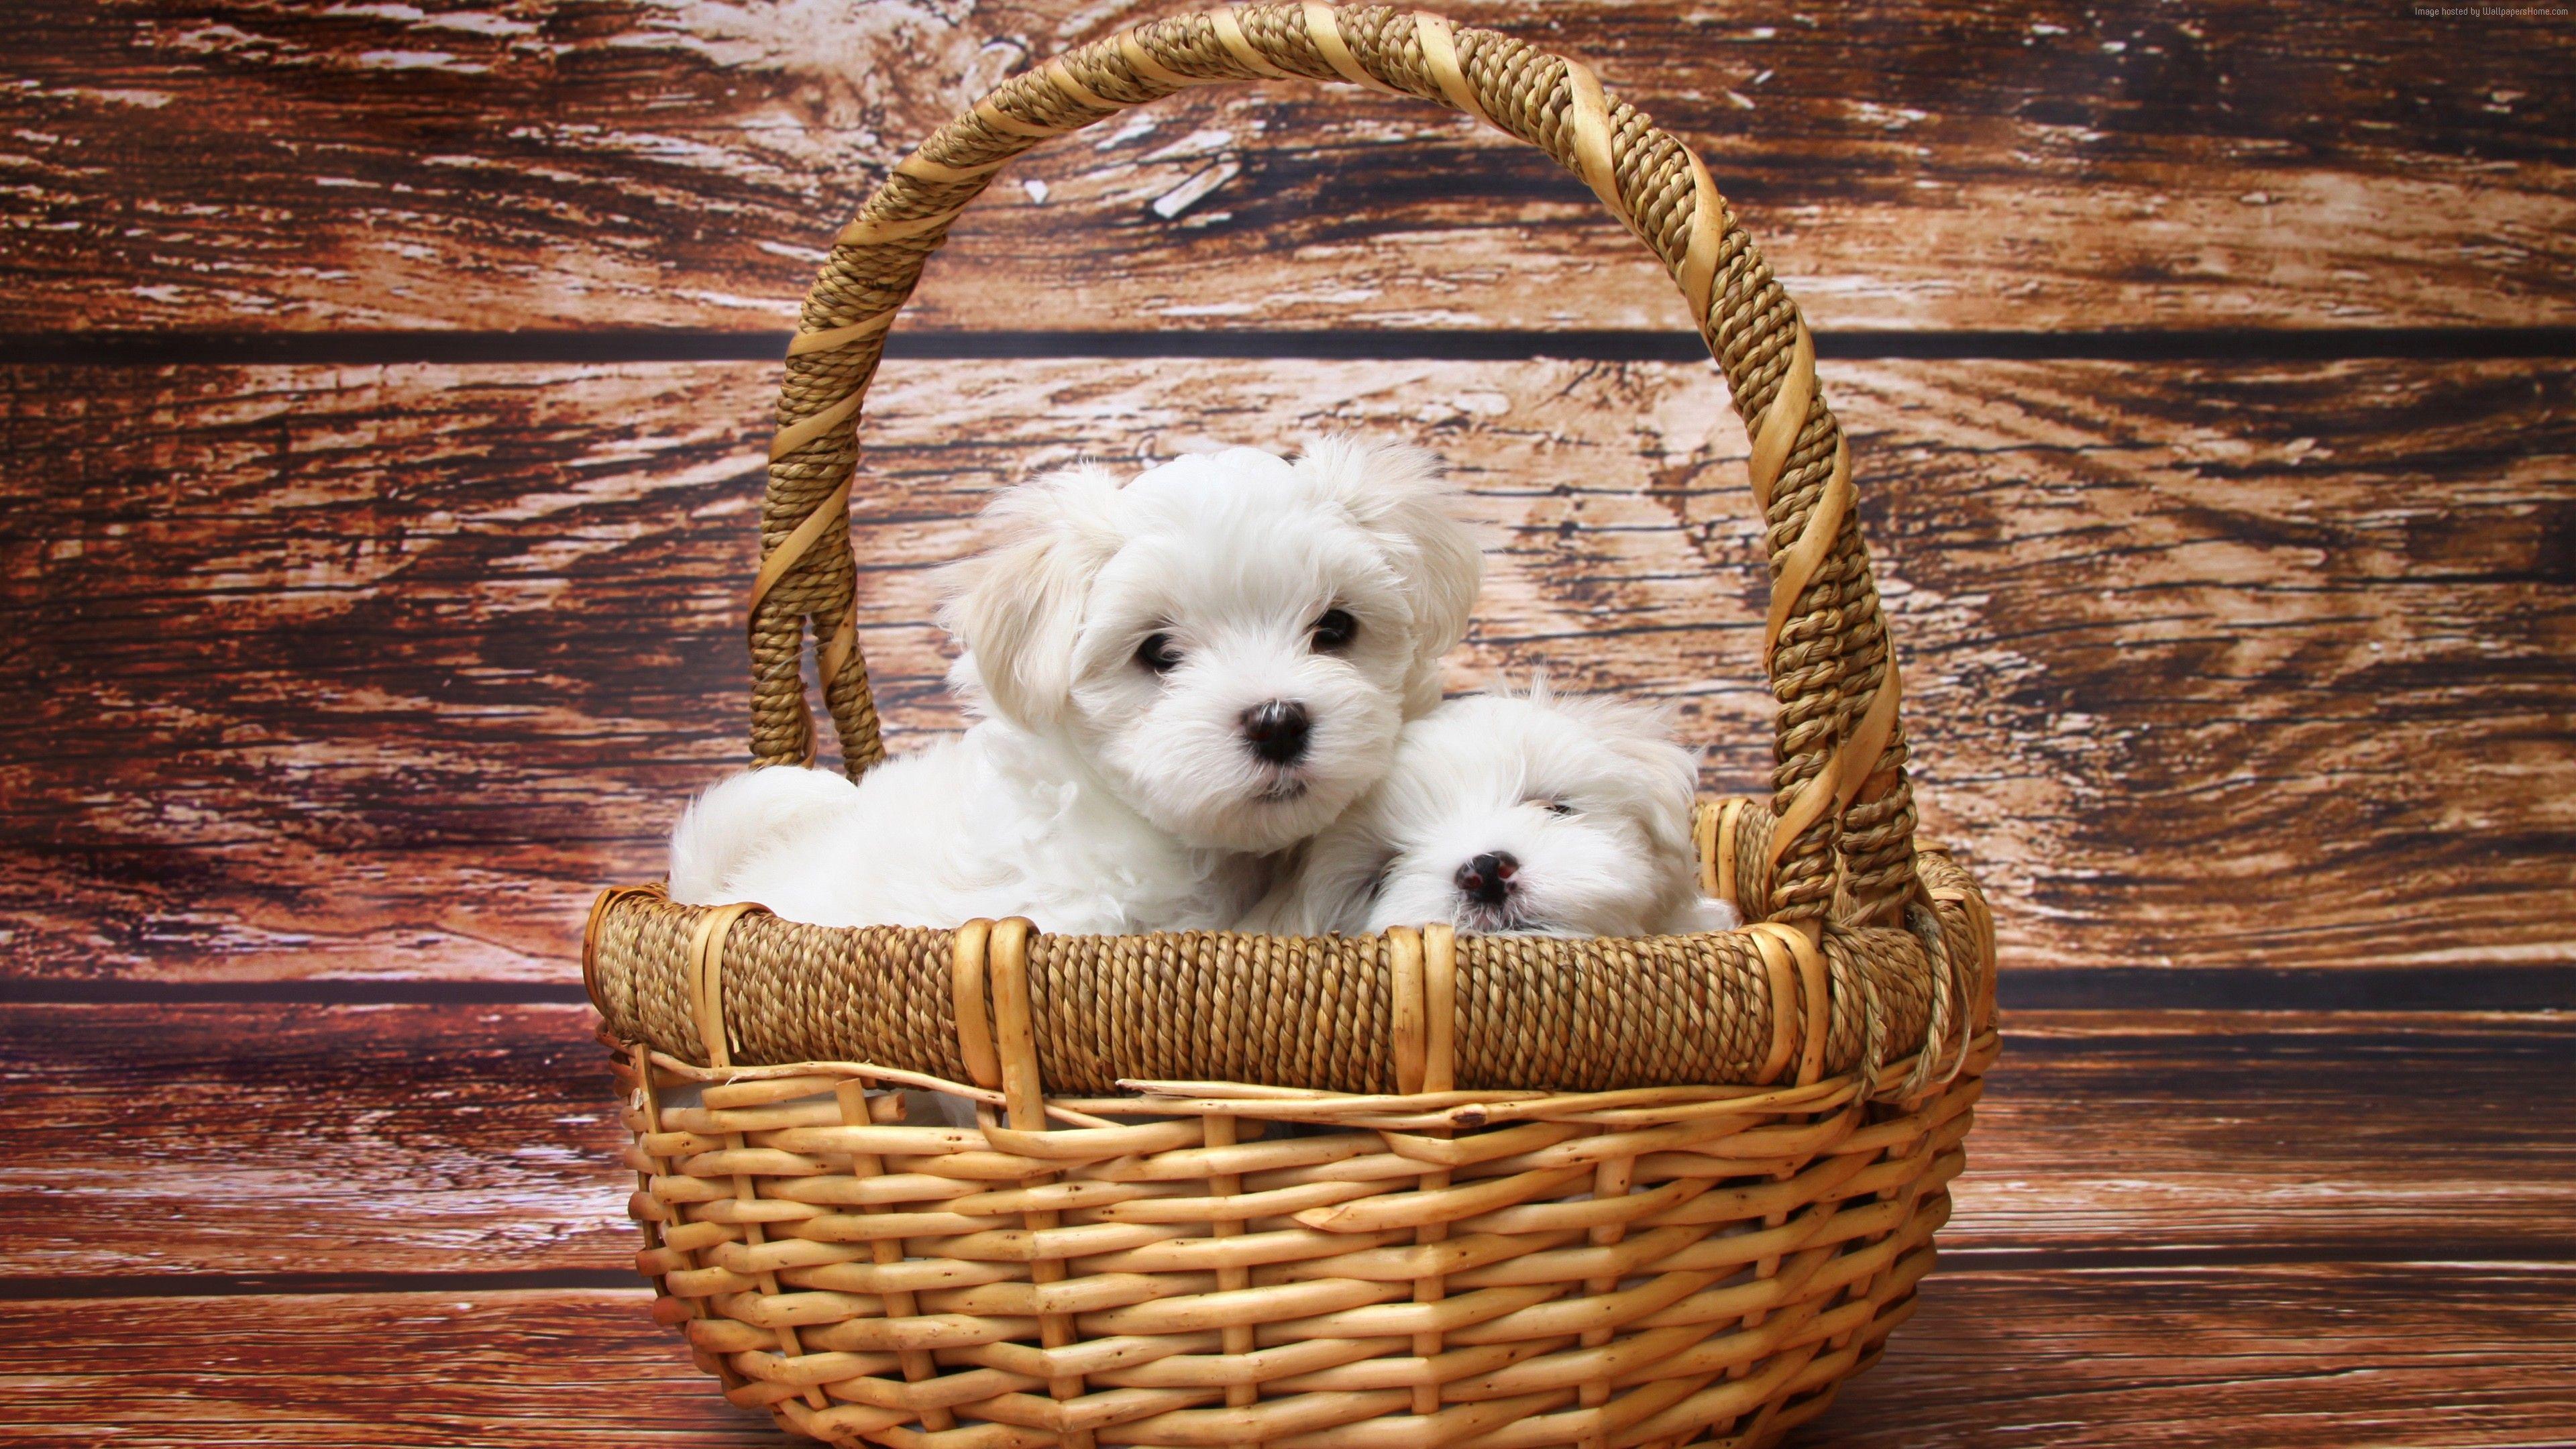 cool Cute white puppies pet 4k wallpaper Girls UHD